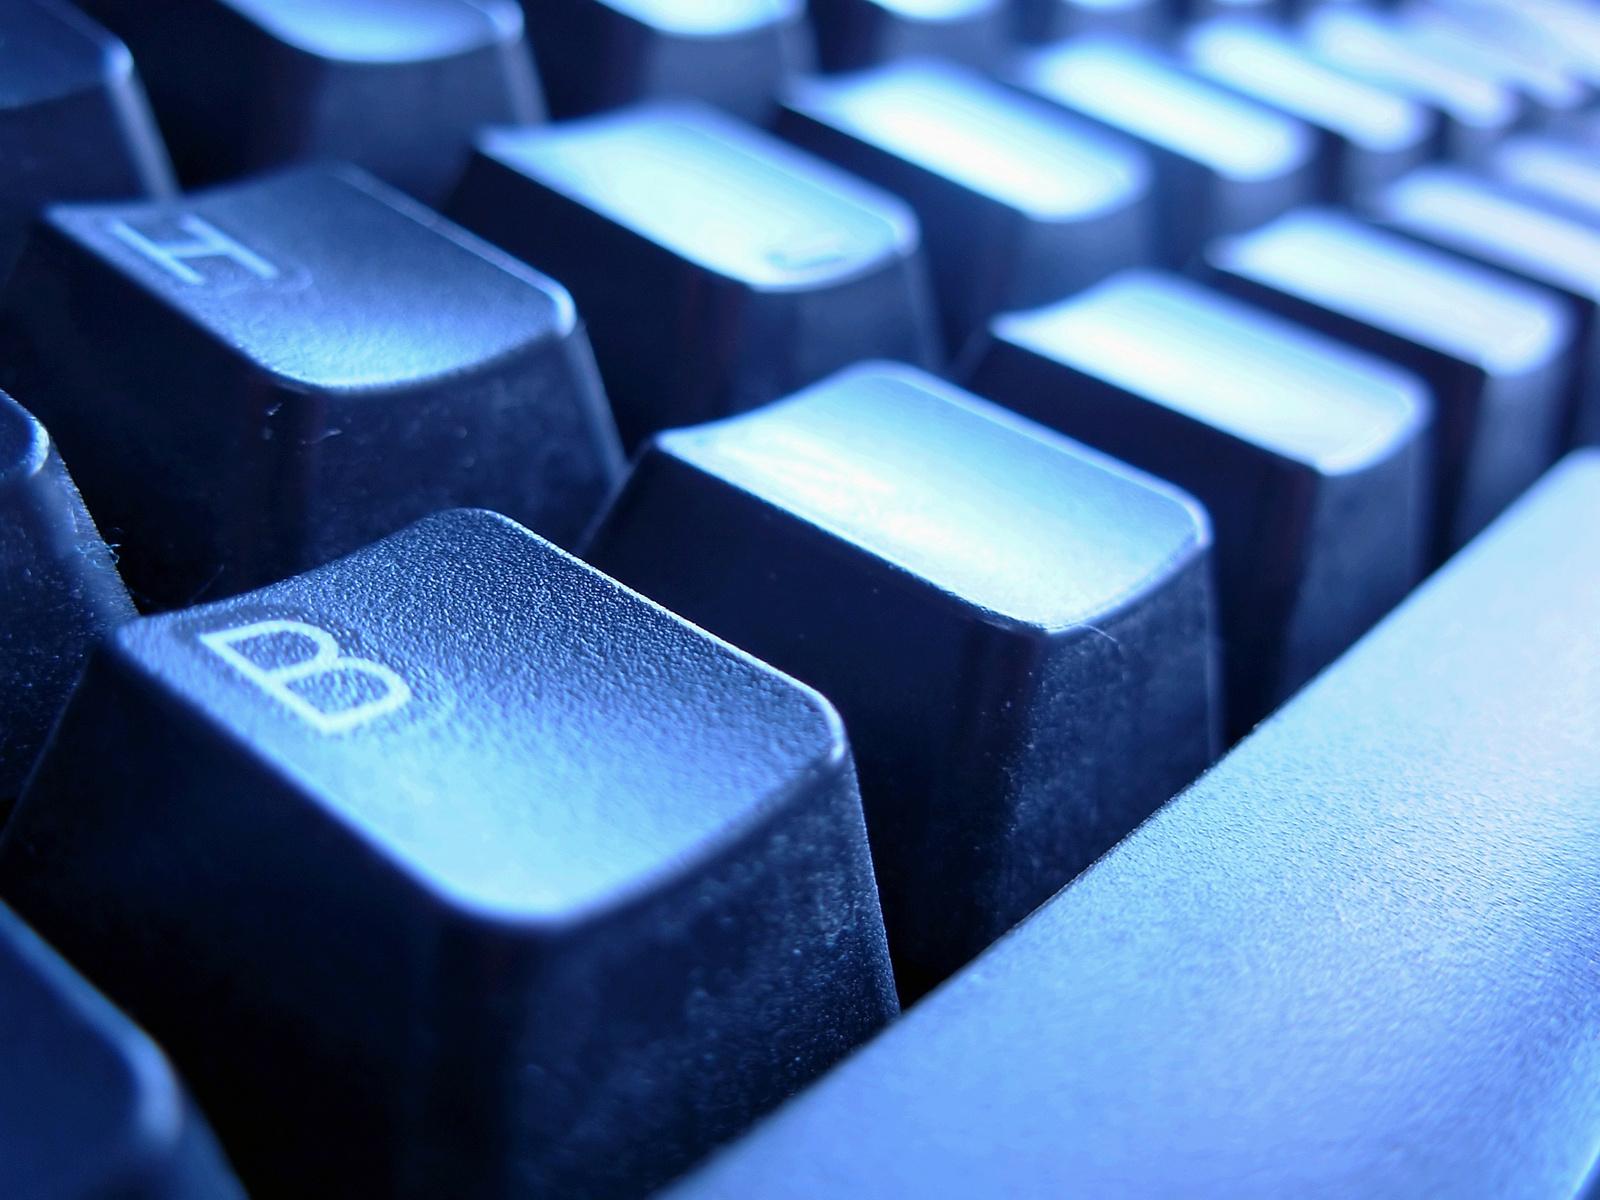 keyboard-3-1195697-1600x1200